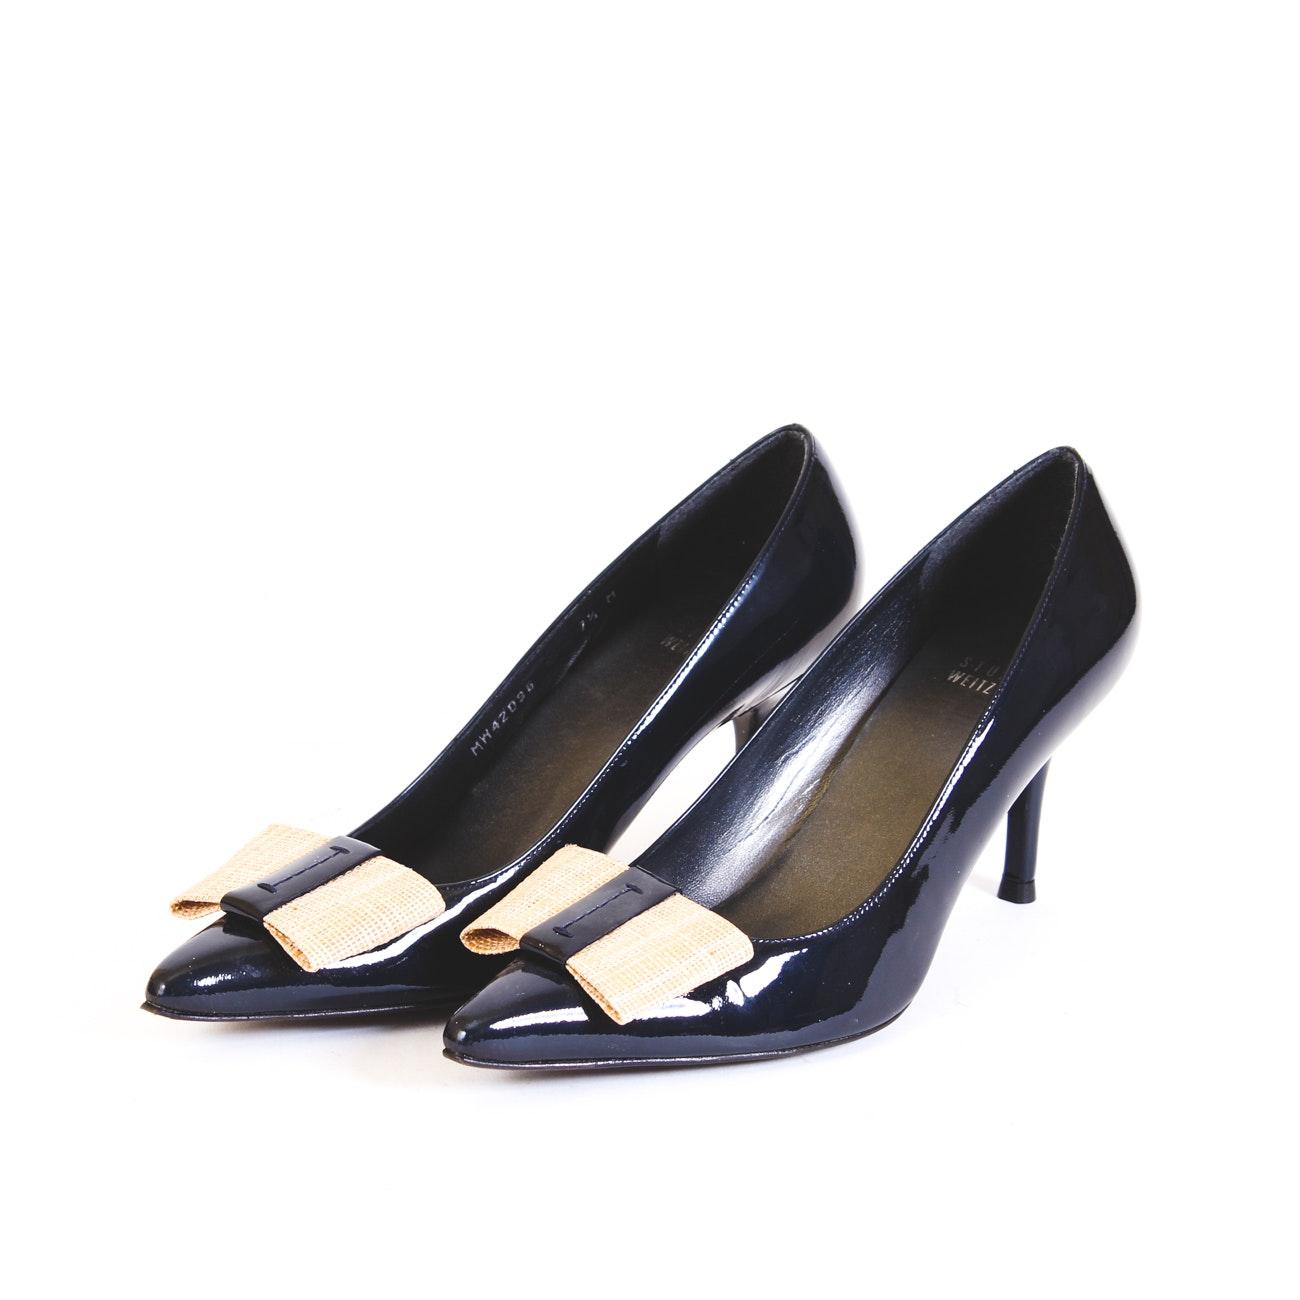 Stuart Weitzman Dark Blue Patent Leather Heels